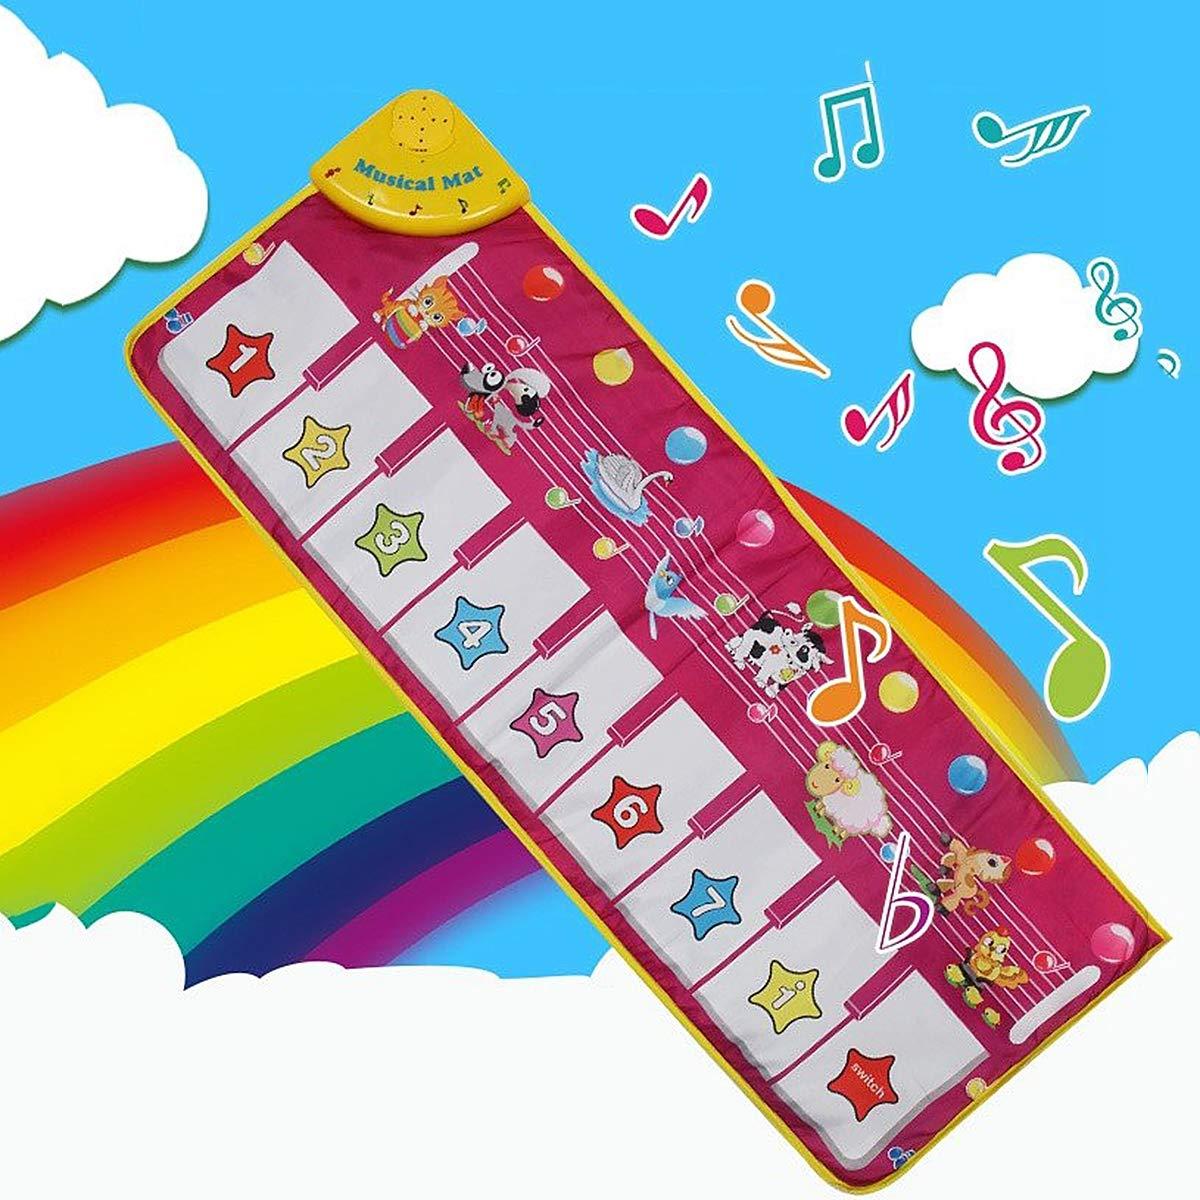 Children's Electronic Piano Mat, Electronic Music Playmat Piano Mat Cartoon Animal Fun Crawling Blanket by Eustoma (Image #2)